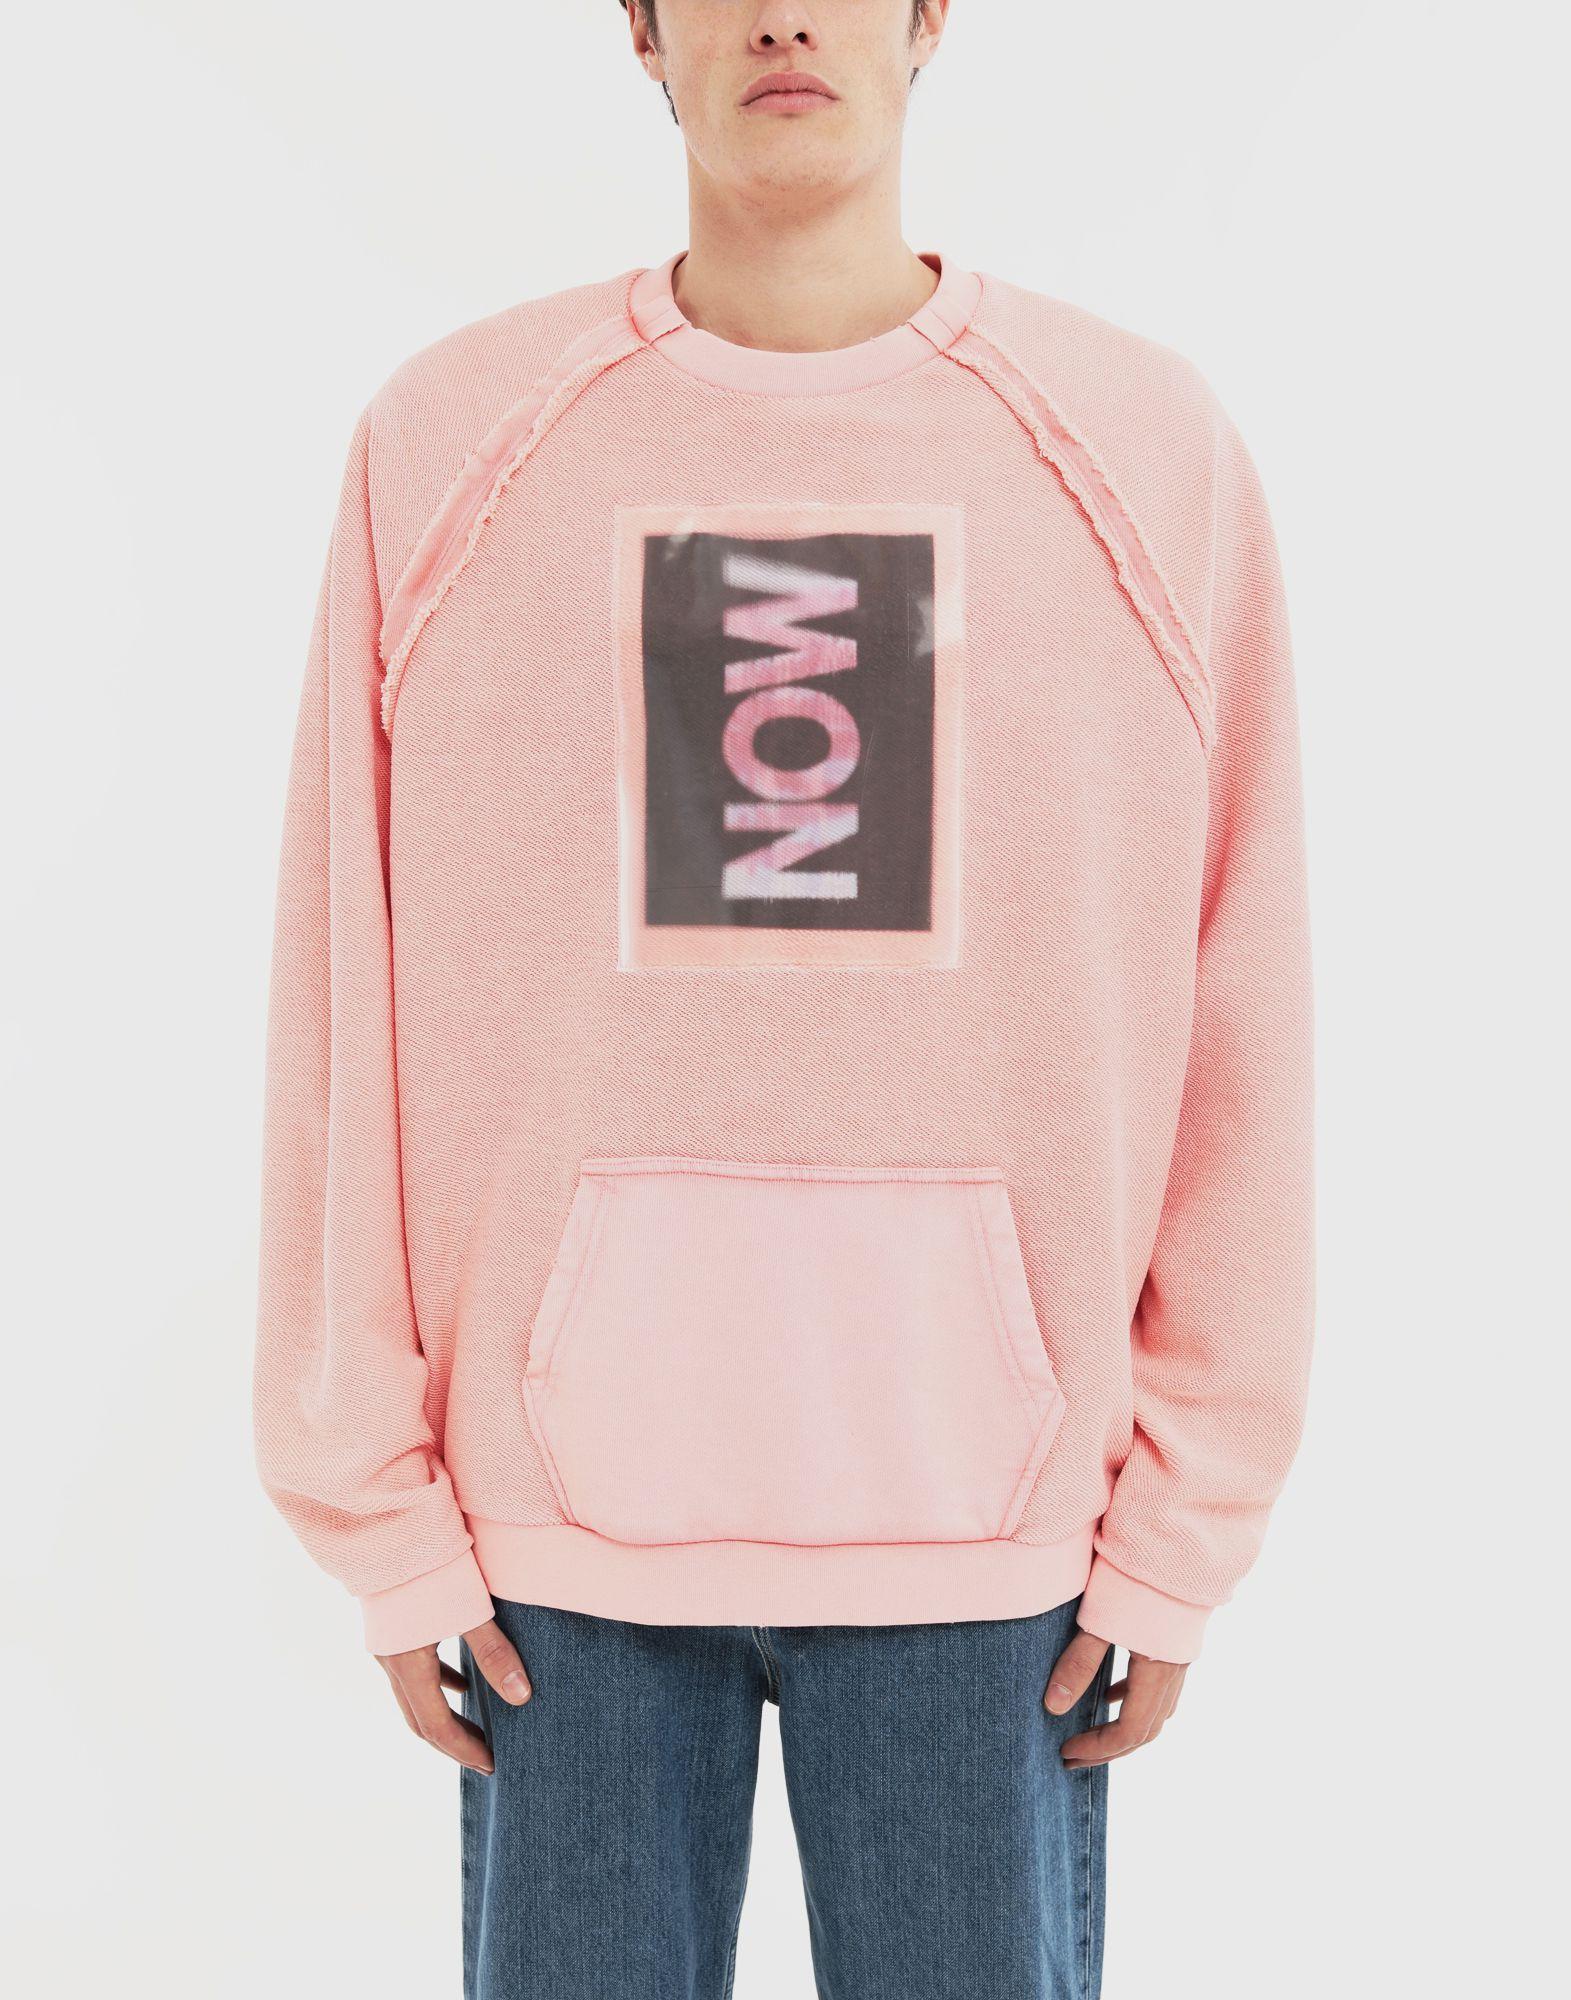 MAISON MARGIELA NOW print jersey sweatshirt Sweatshirt Man r